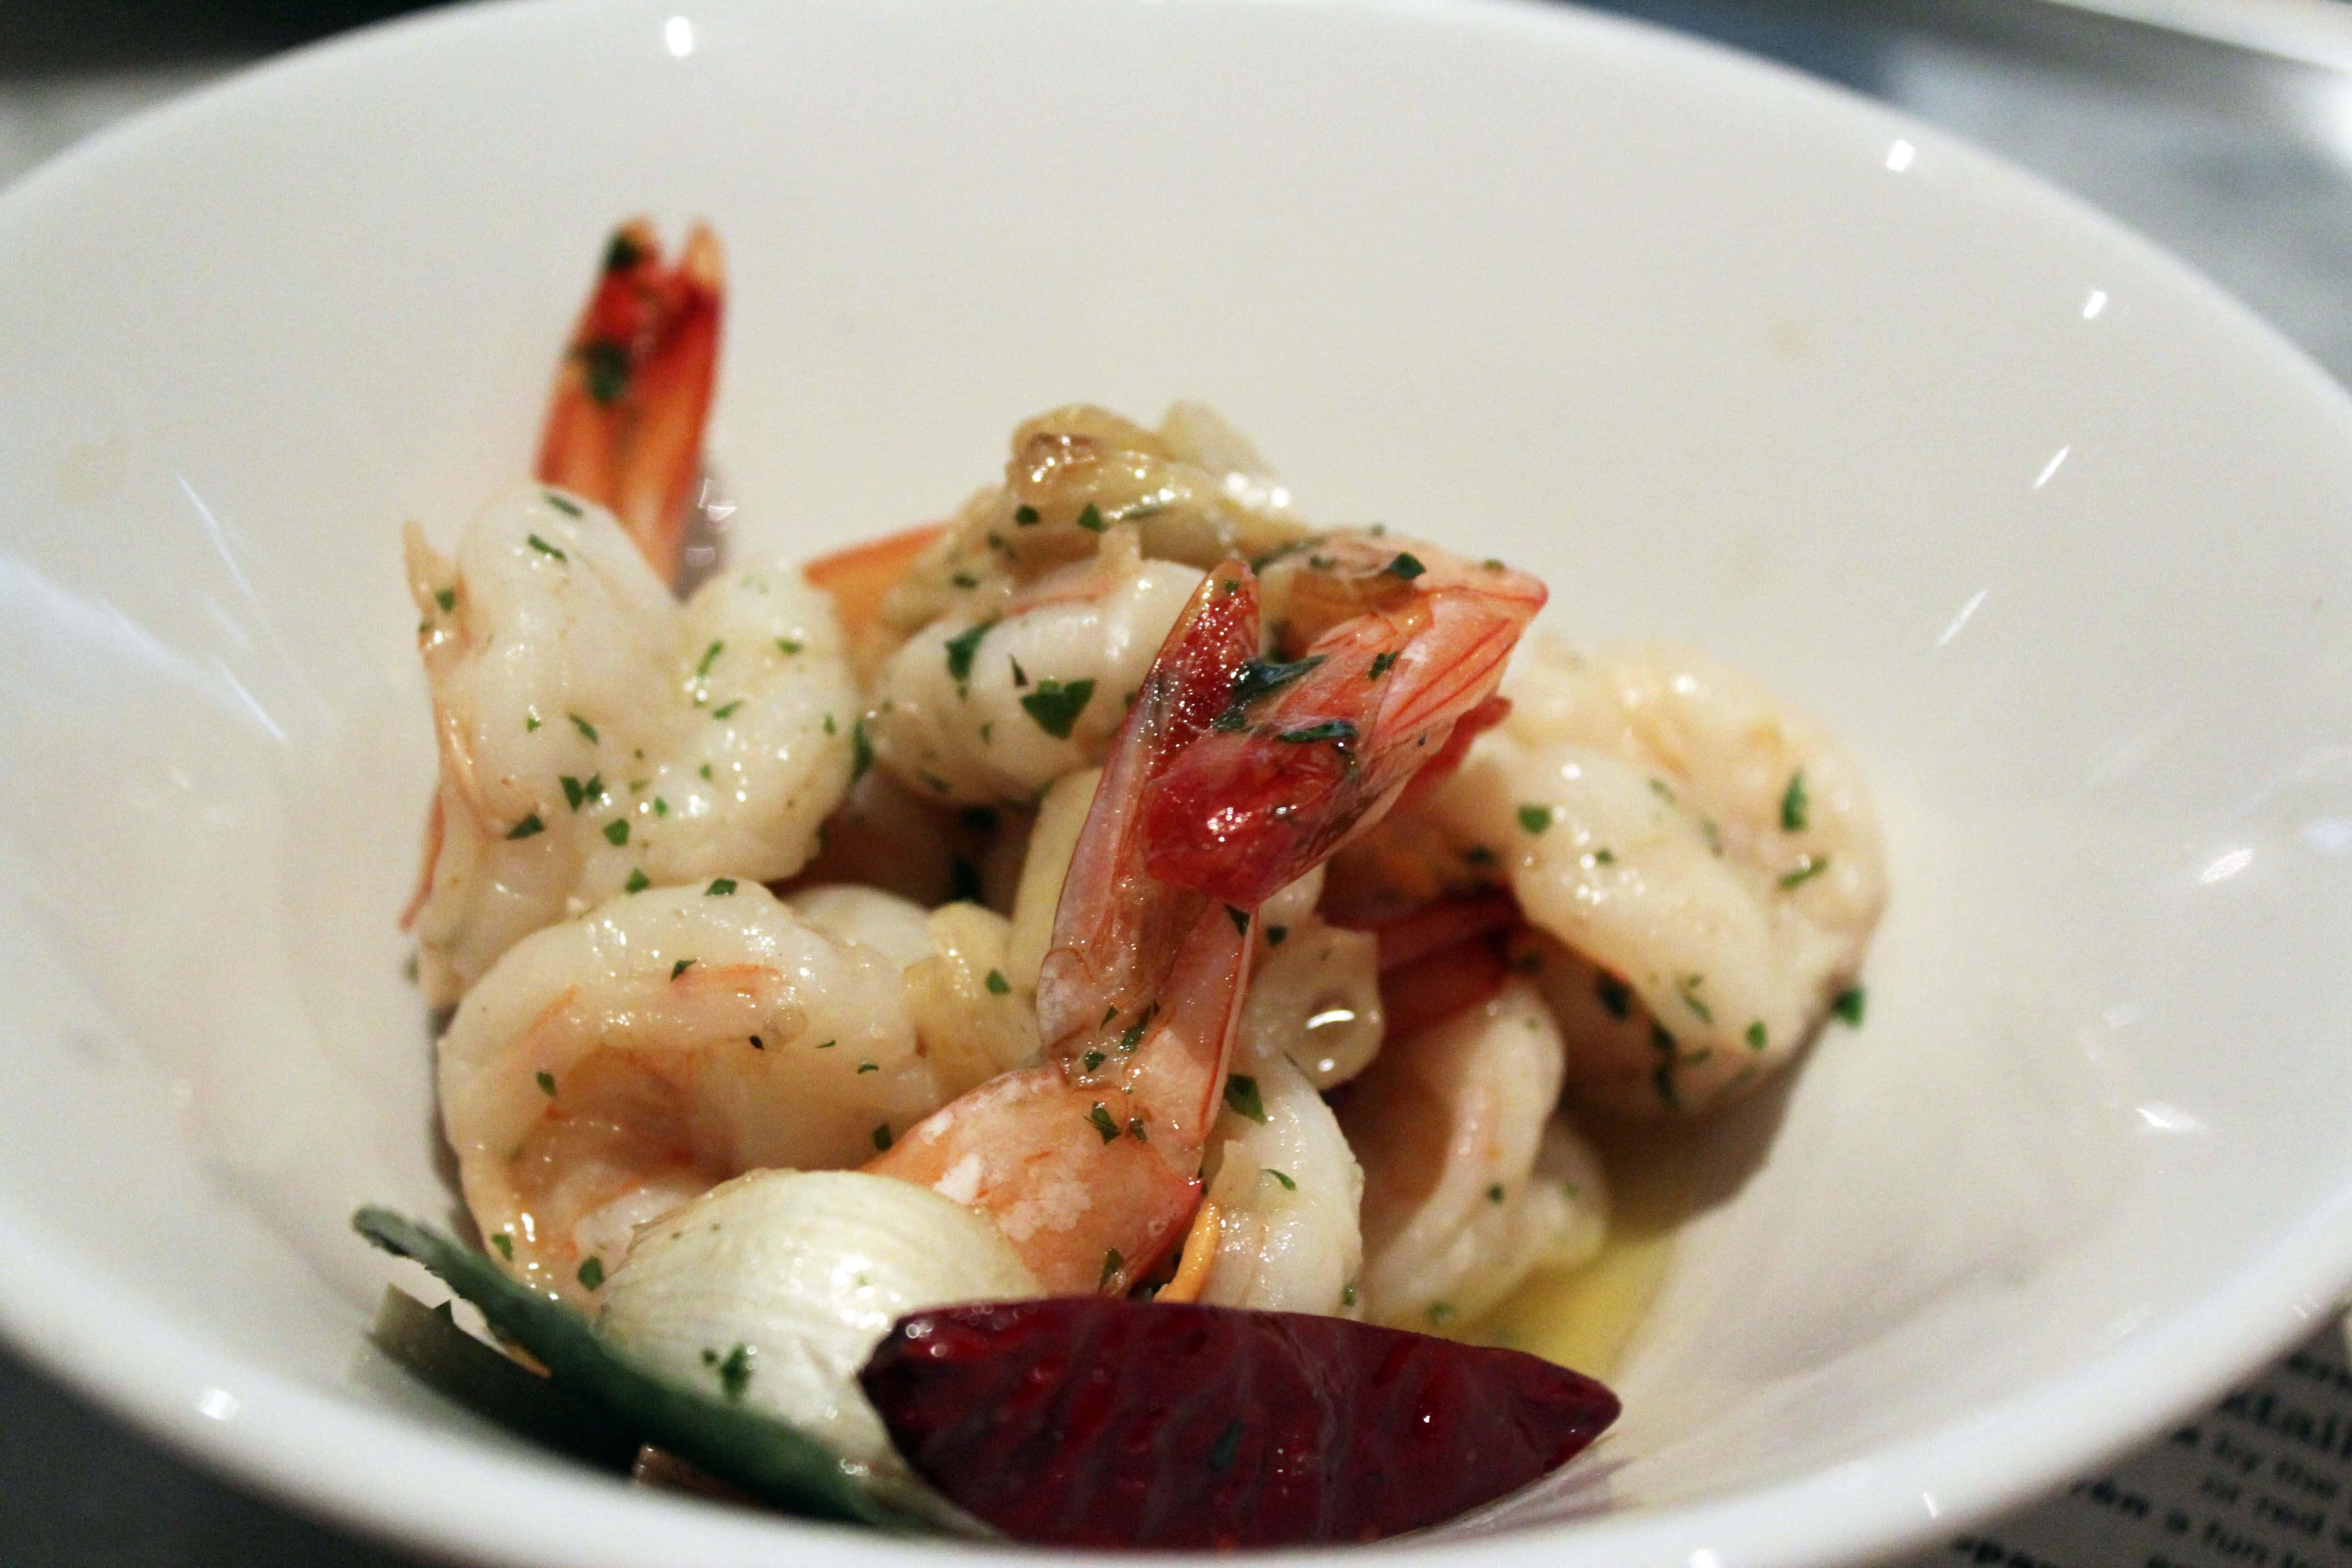 Shrimp and garlic appetizer